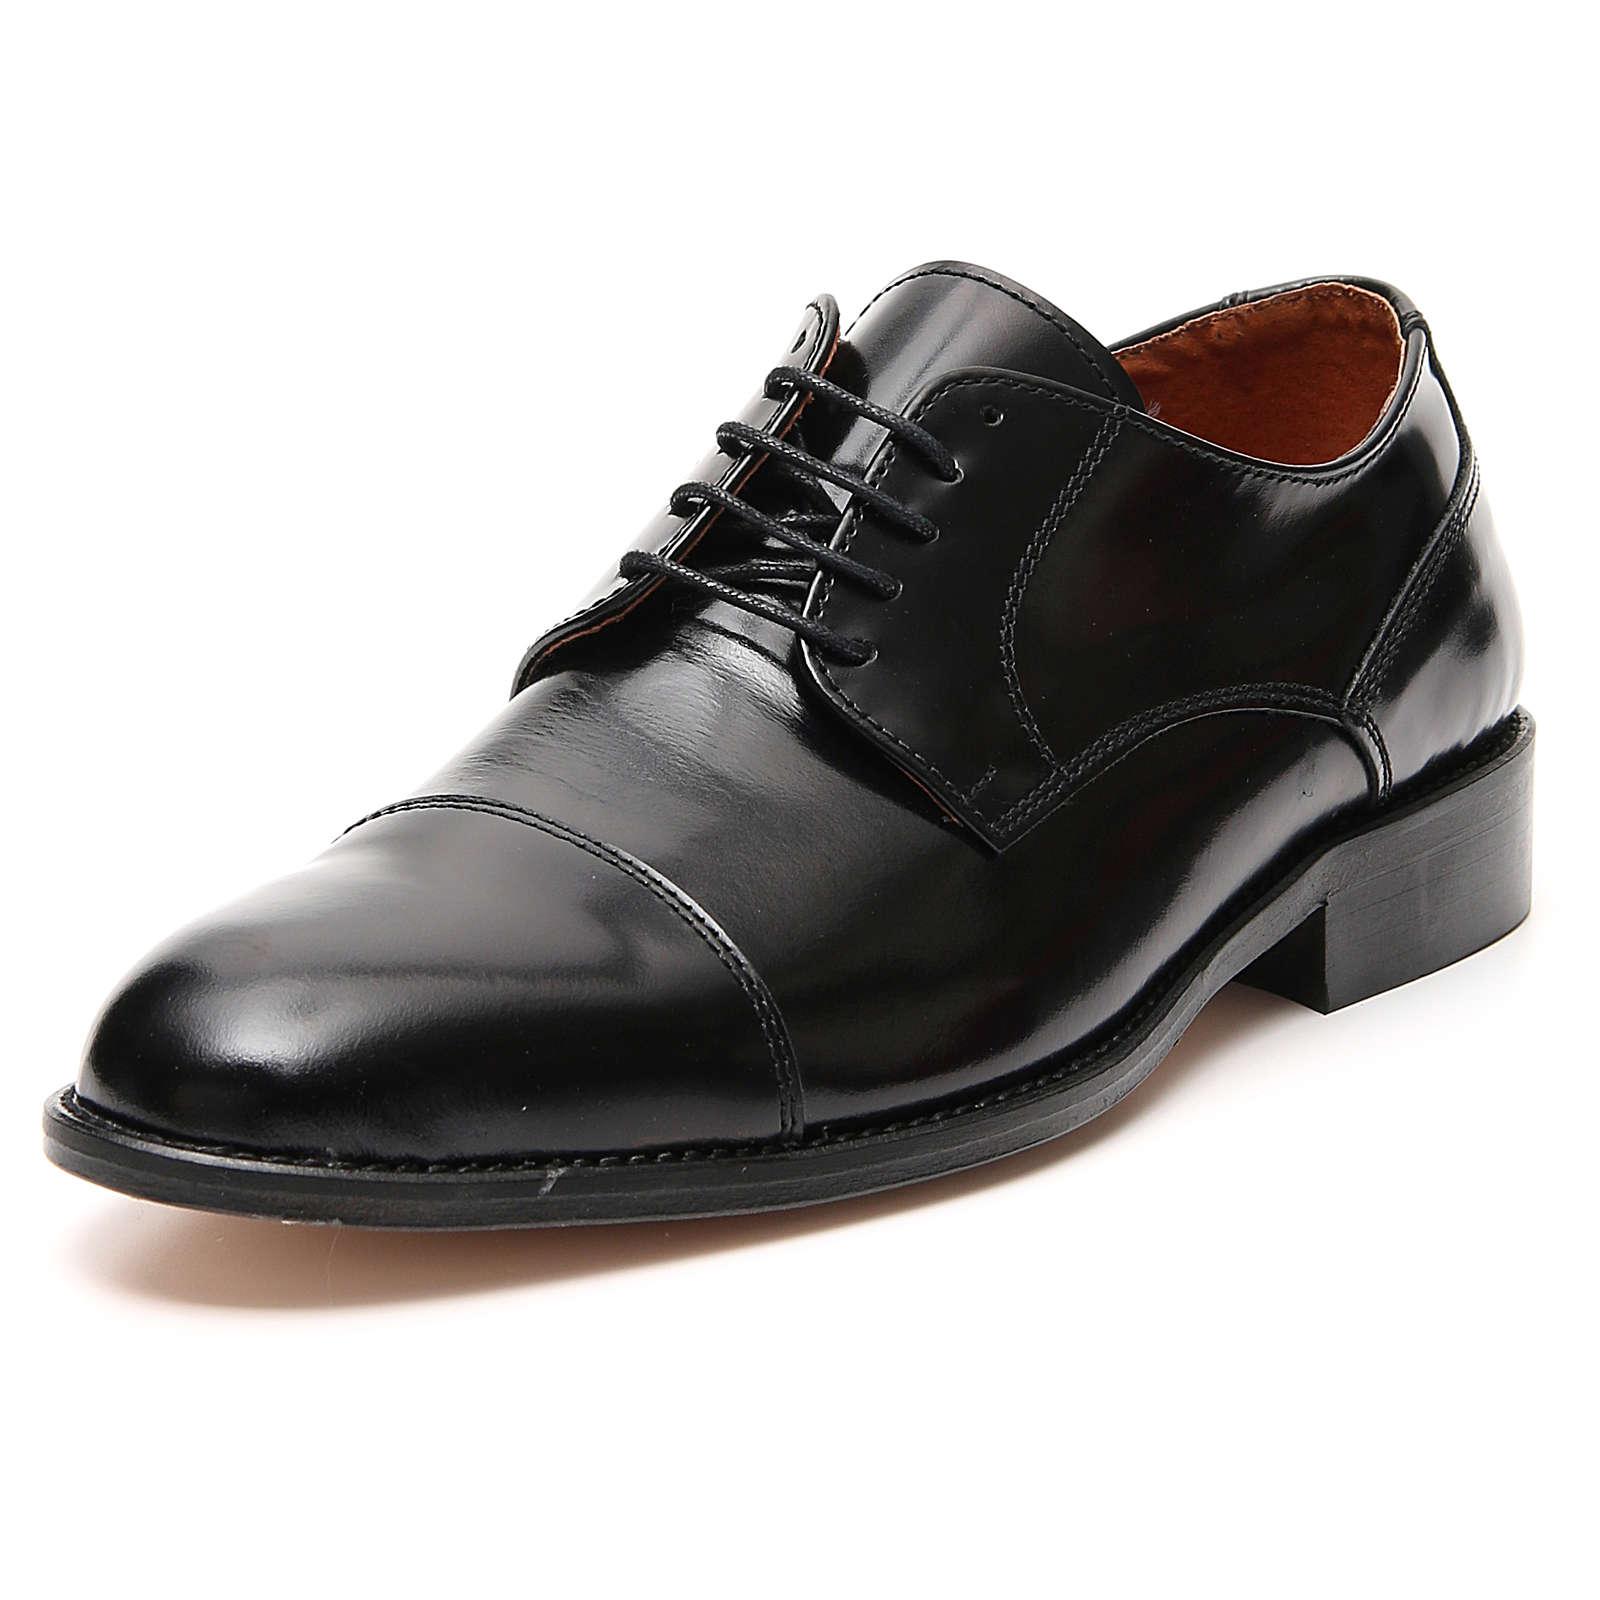 Sapatos couro verdadeiro abrasivato prato ponta reforçada 4